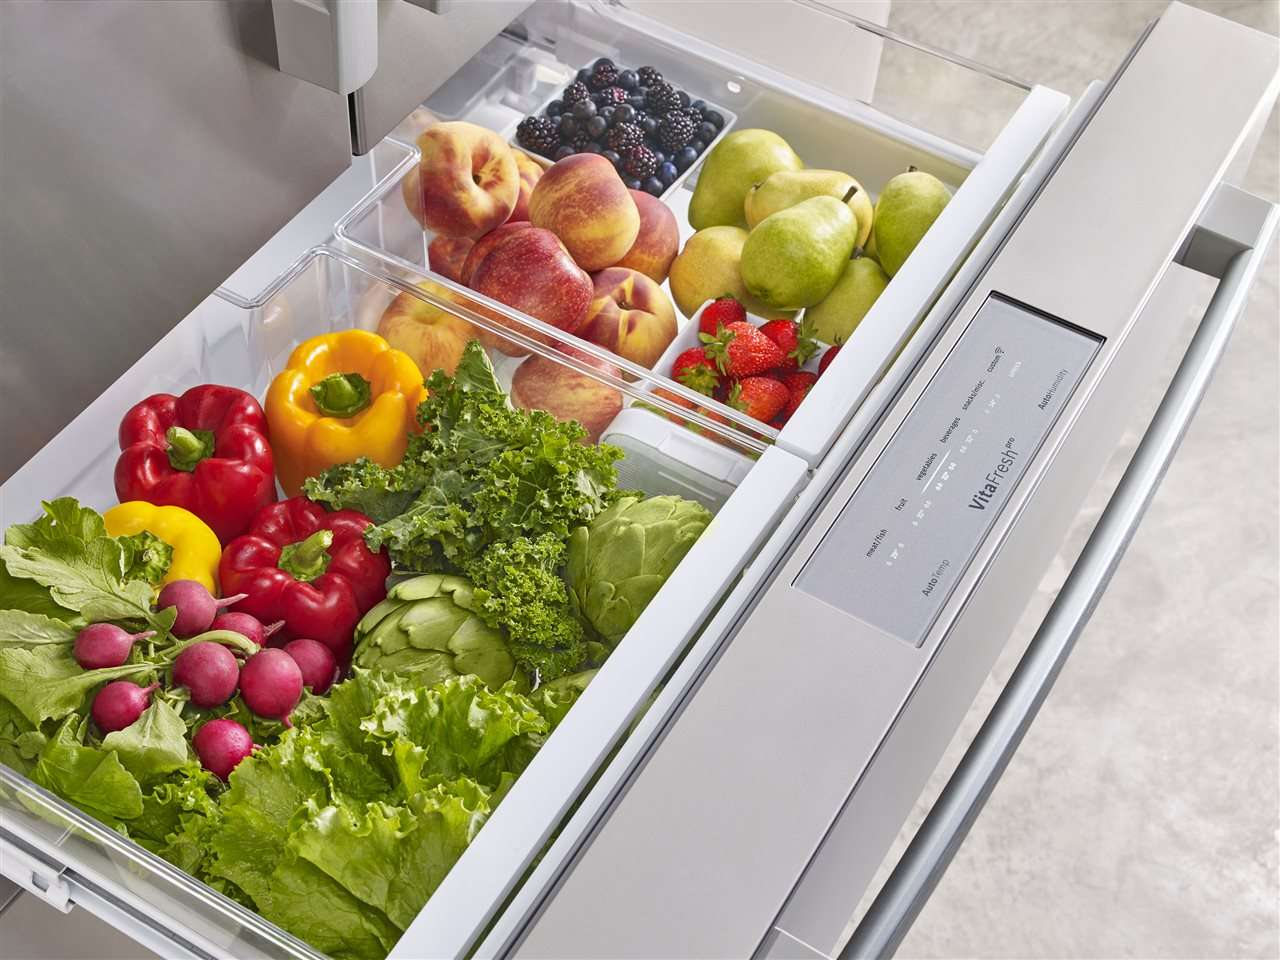 Refrigerator with Veggies